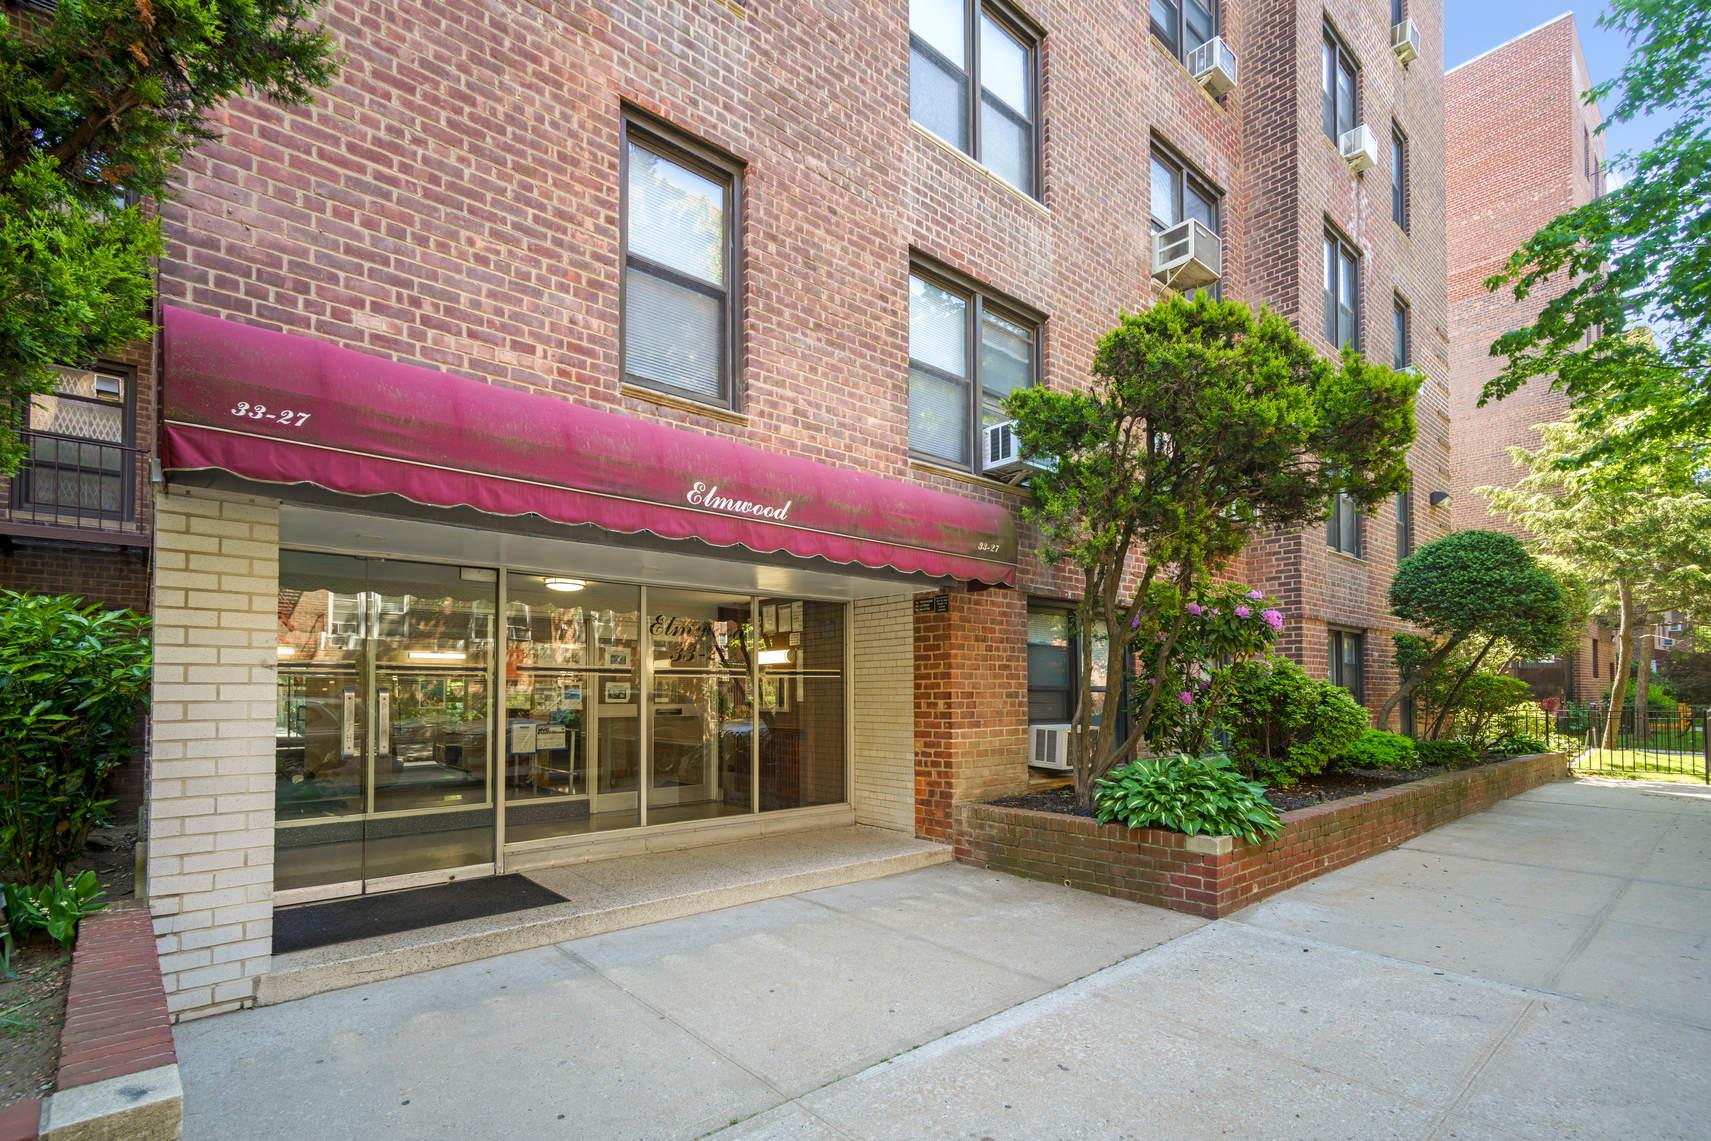 33-27 91st Street, Unit 1B photo